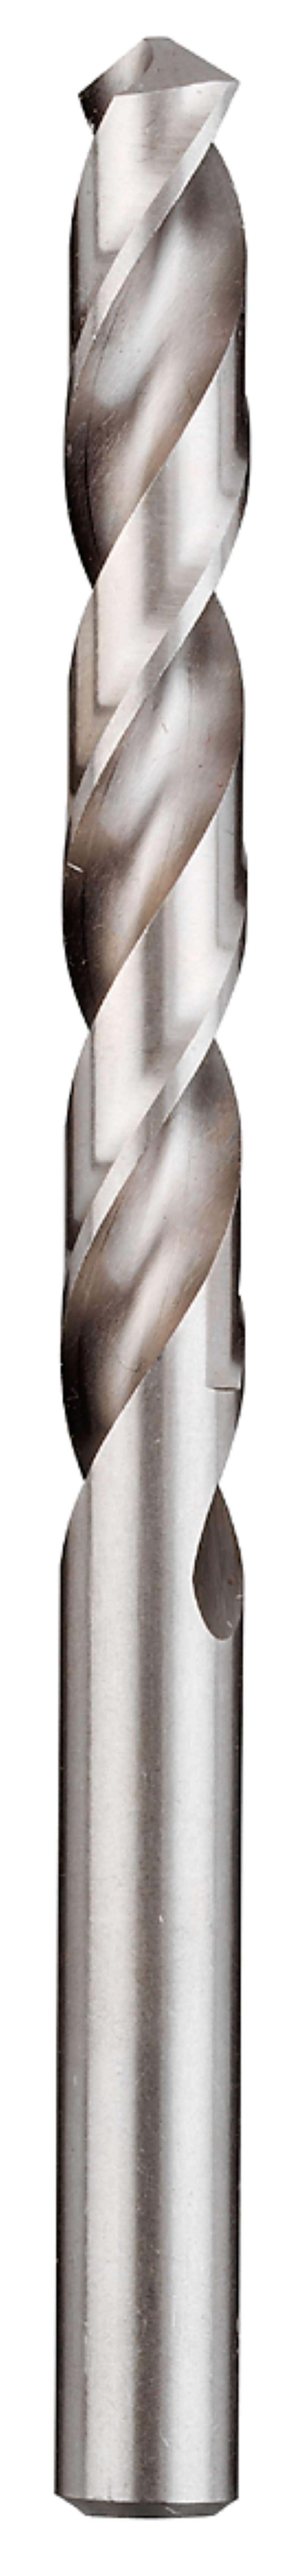 Купить Сверло по металлу Kwb 206-542